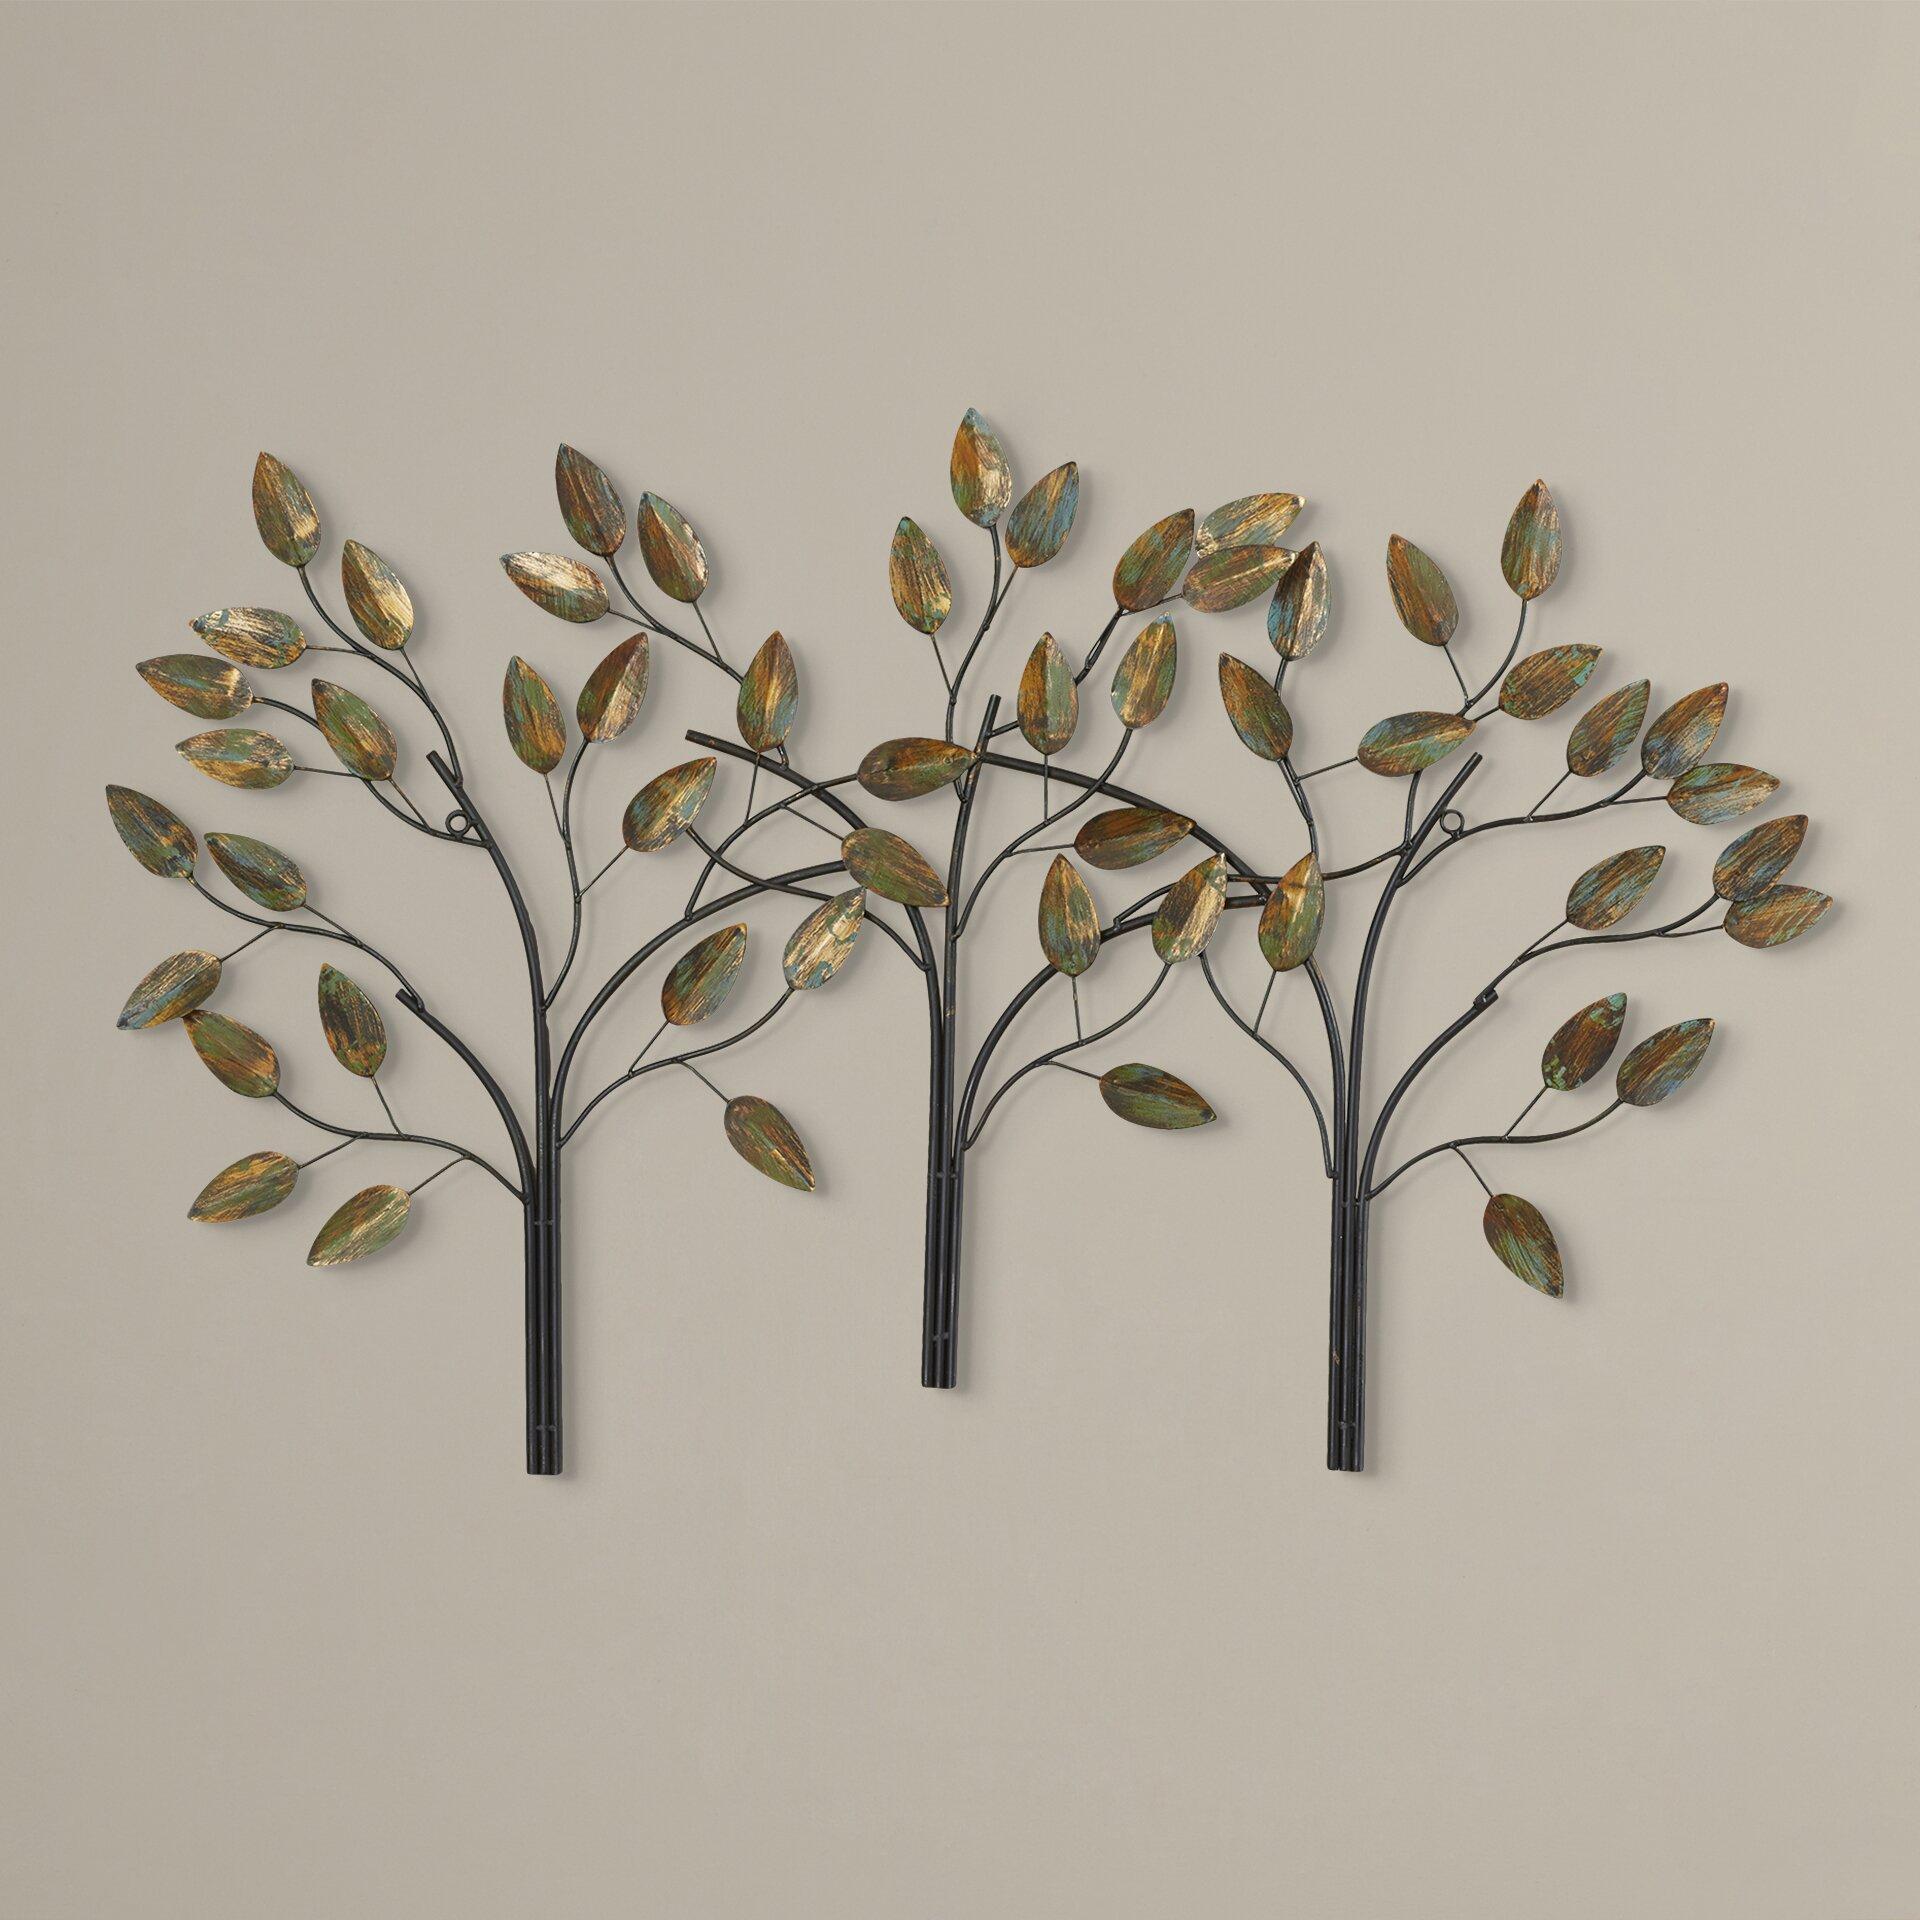 Wall Art Of Leaves : Charlton home desford leaf wall d?cor reviews wayfair